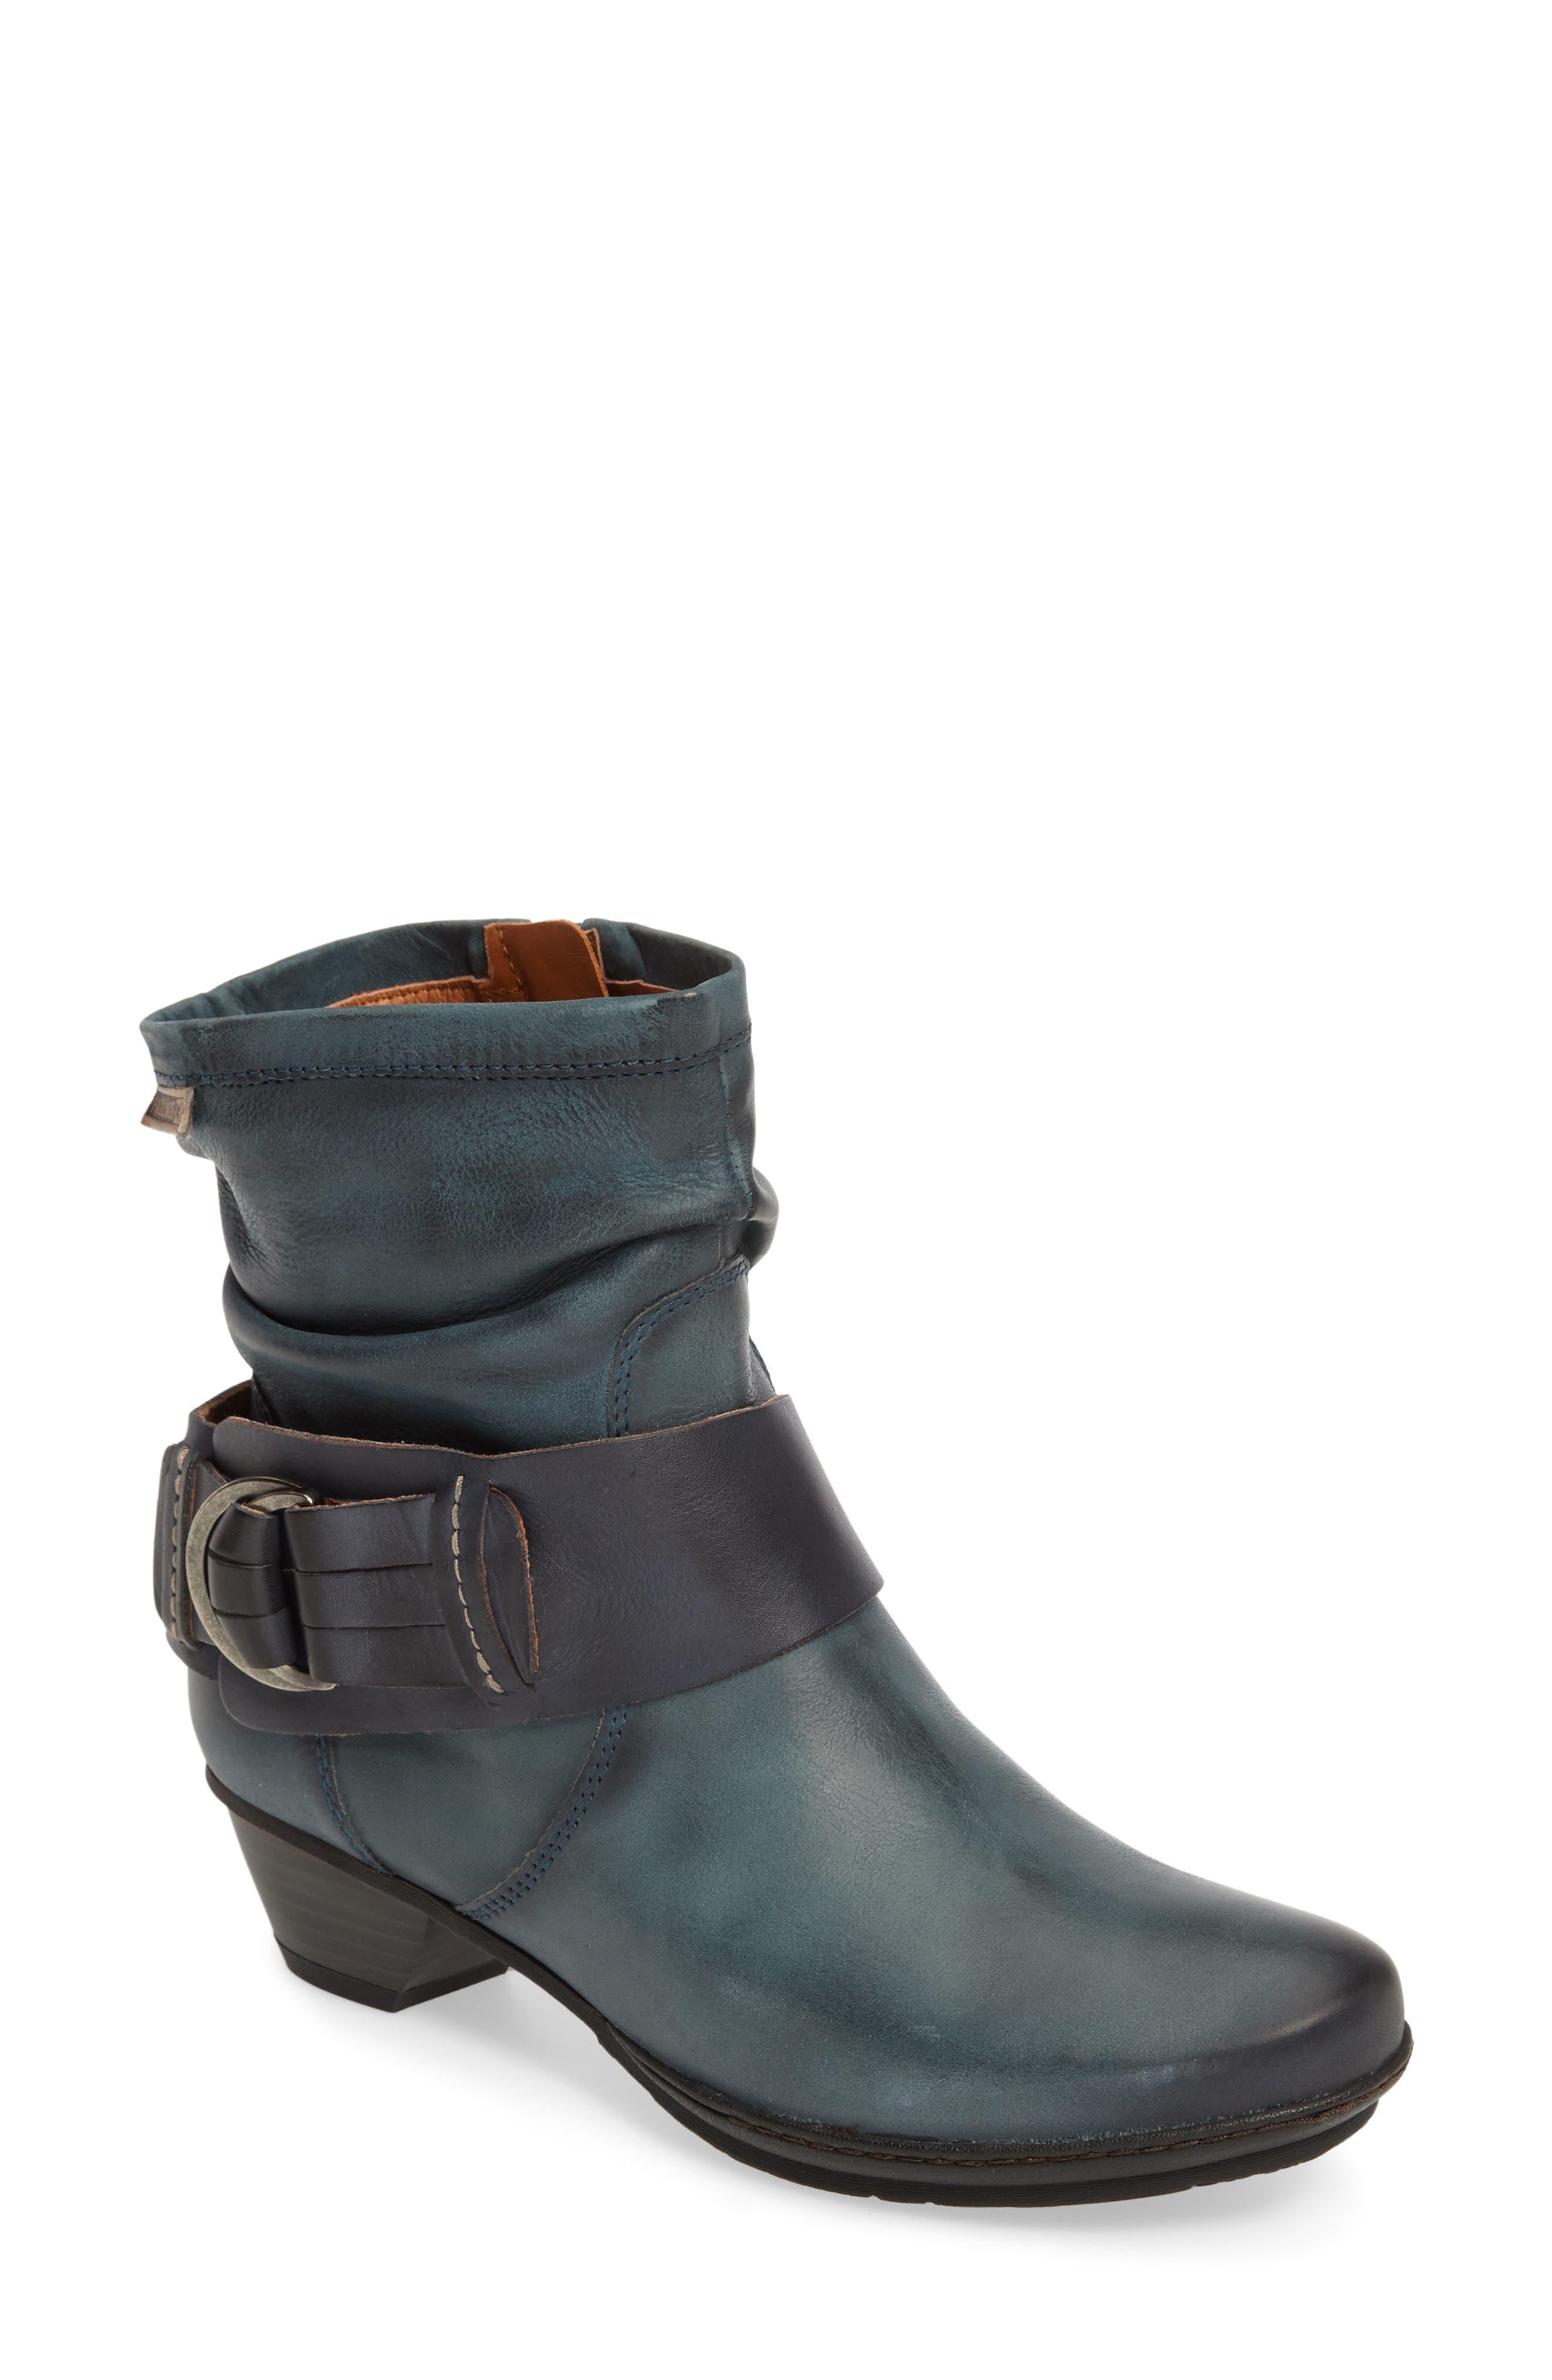 Alternate Image 1 Selected - PIKOLINOS 'Brujas 801' Boot (Women)